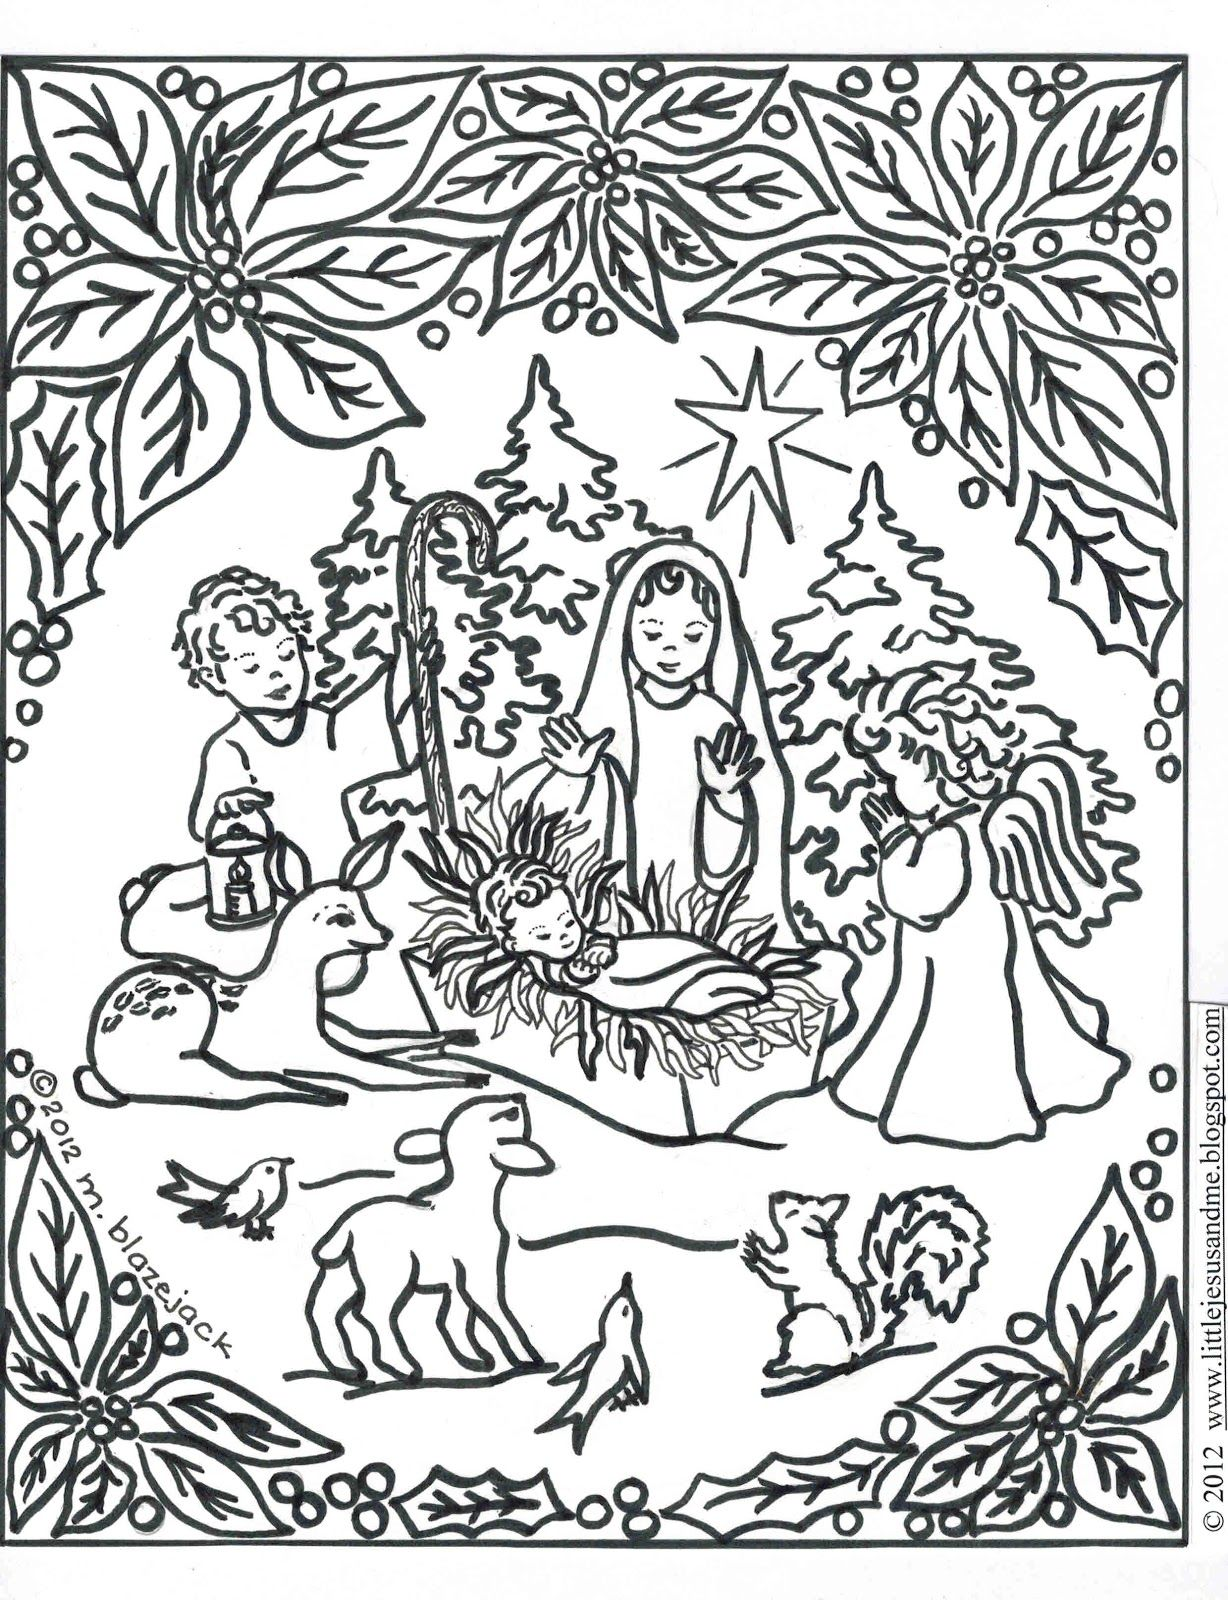 Jesus and Nativity Coloring Page  Nativity coloring, Nativity